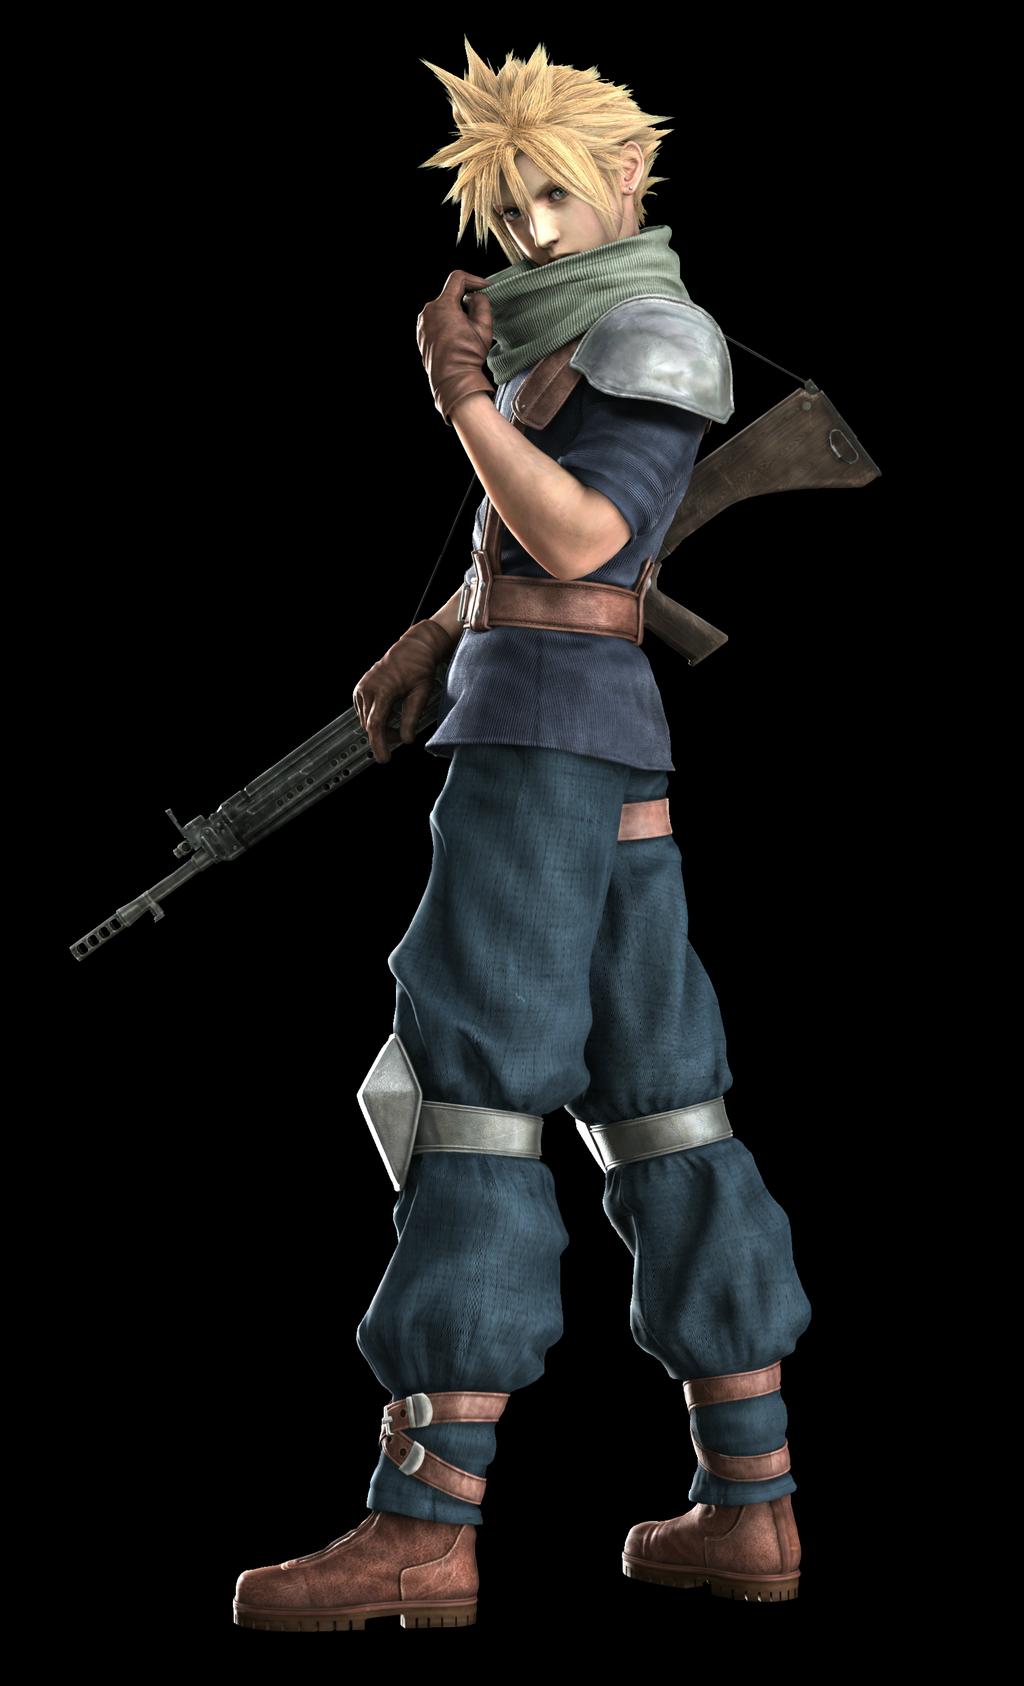 Final Fantasy 7 Ex Solider ACADEMY Men/'s Gaming T-Shirt